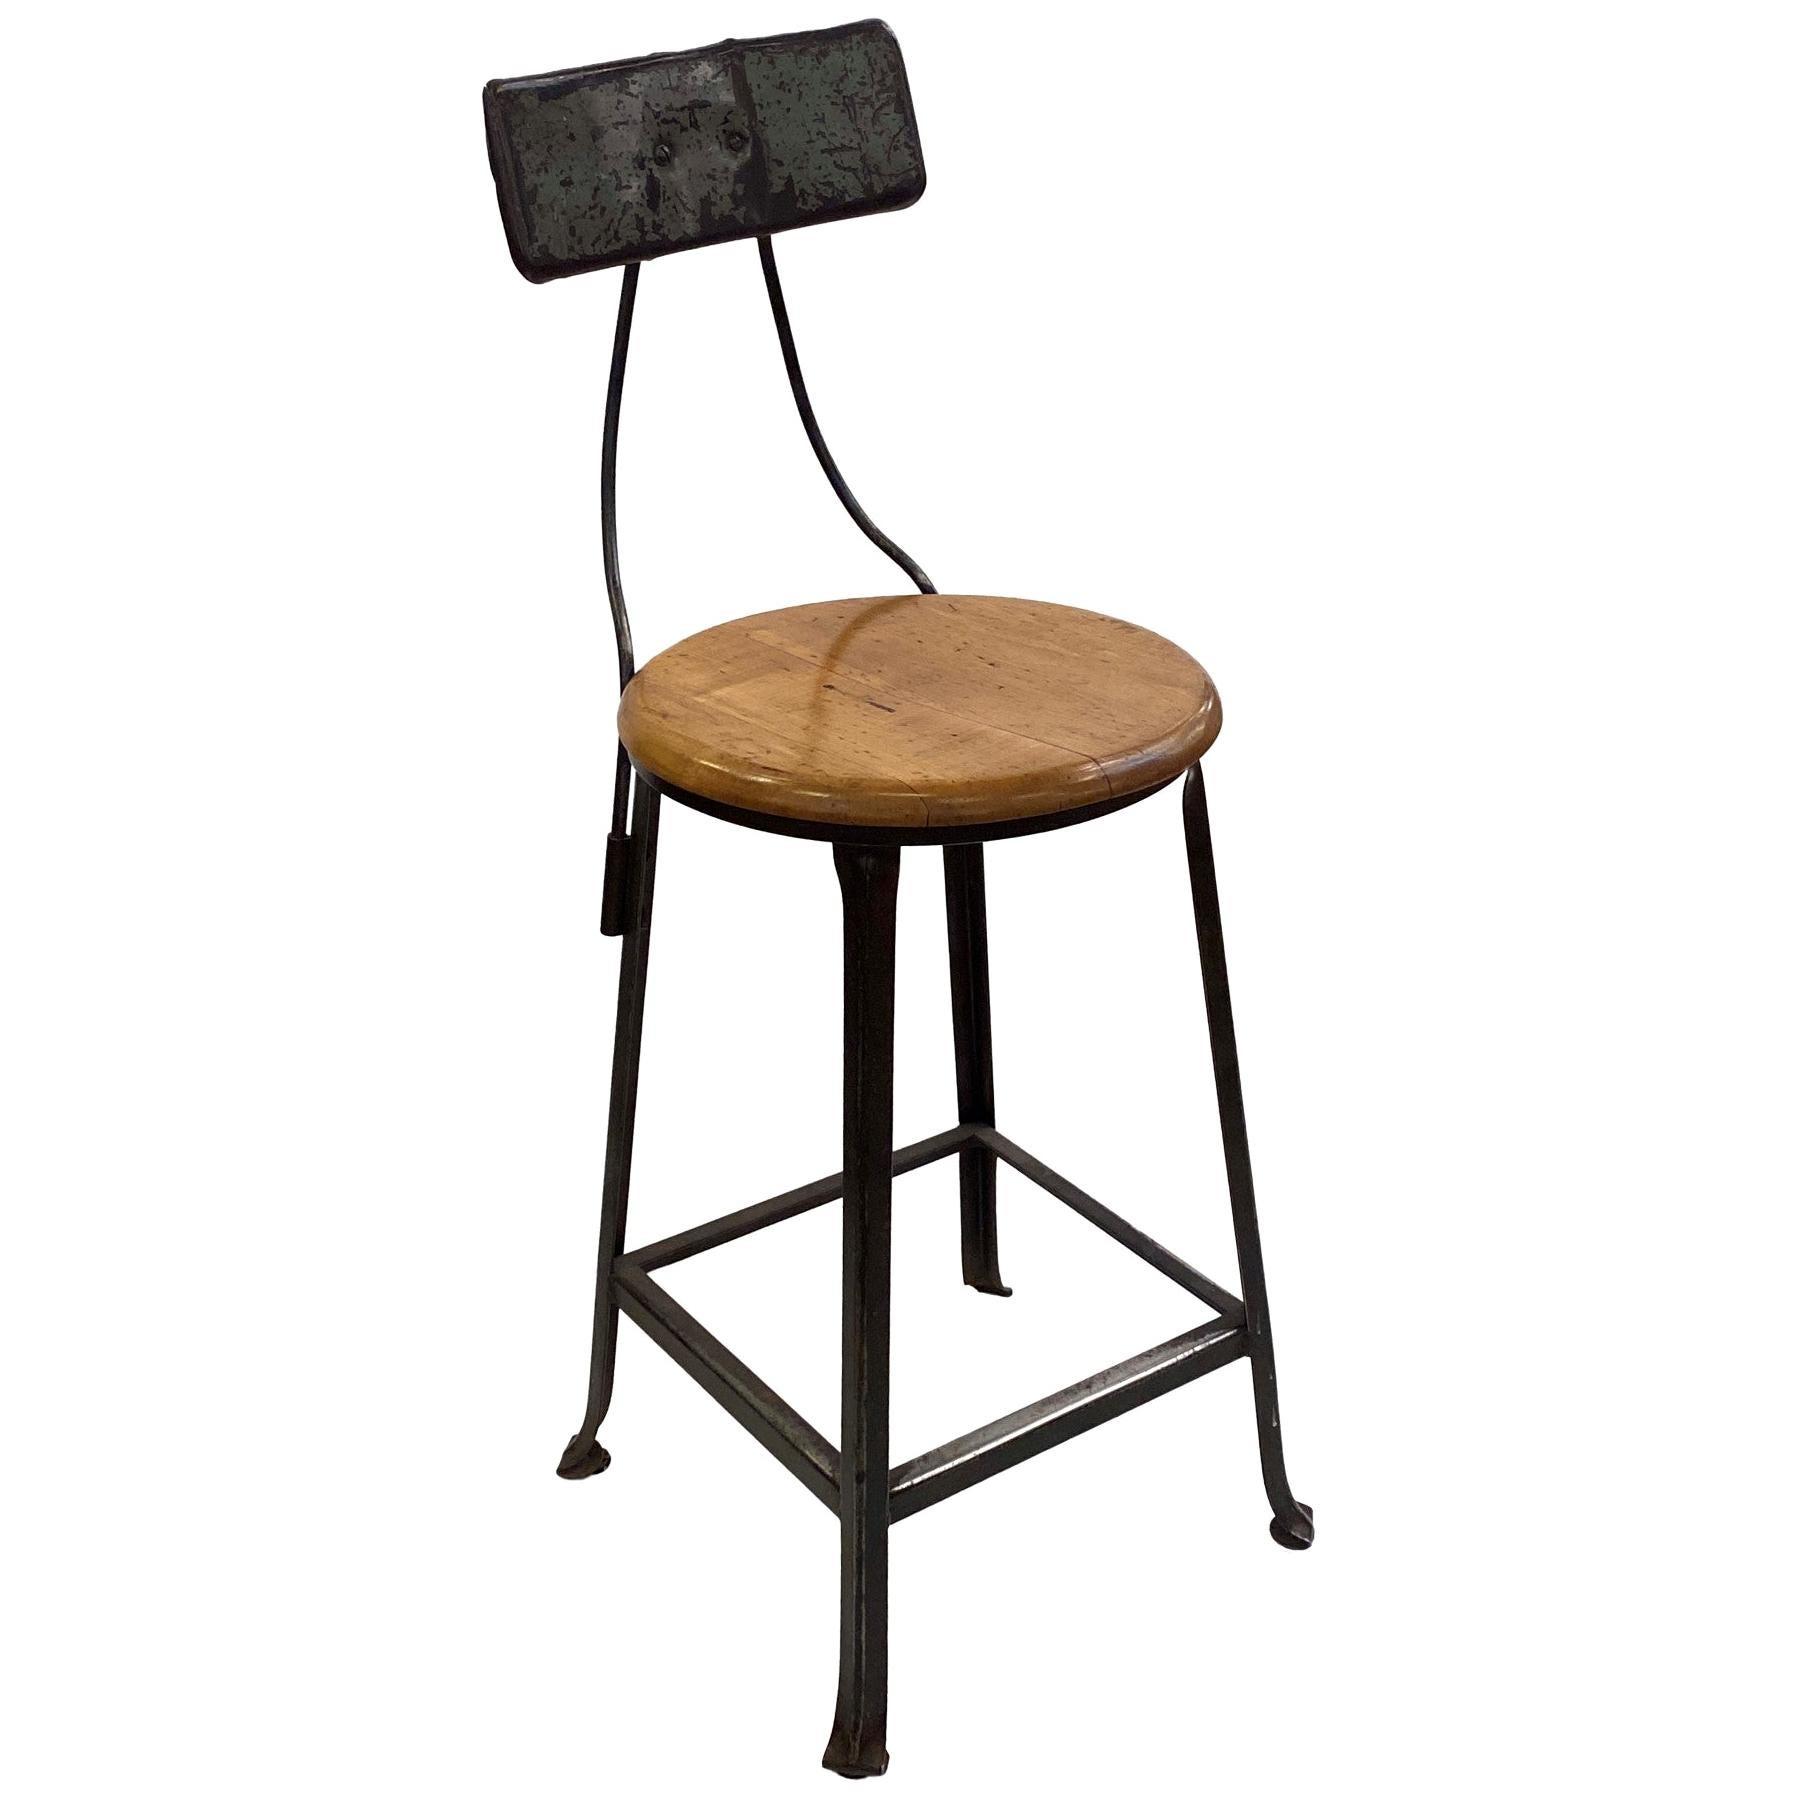 1940s Industrial Bar Height Steel & Wood Stool